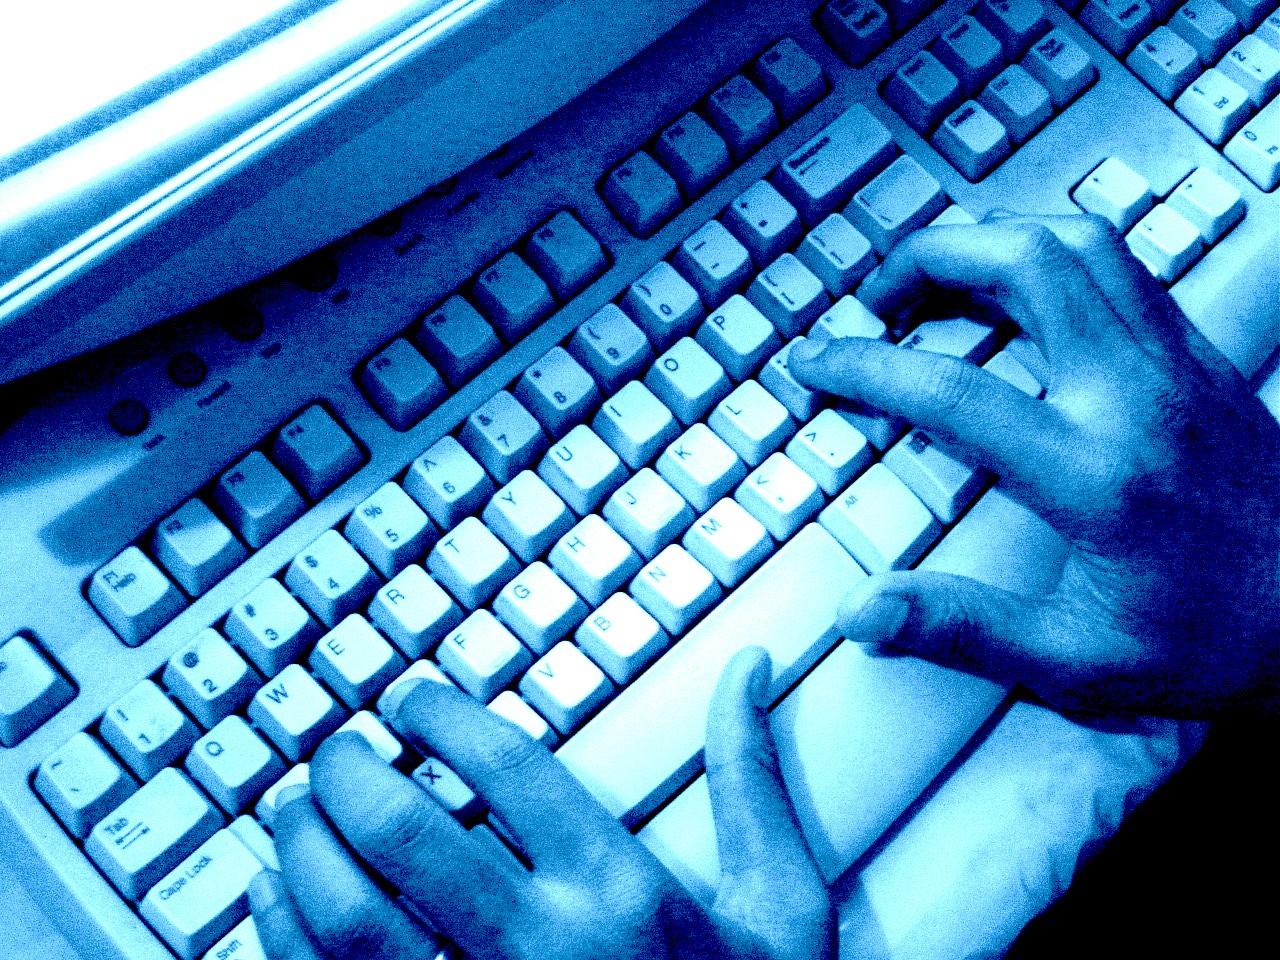 Хакеры Anonymous совершили 97 атак на японские сайты за 3 месяца